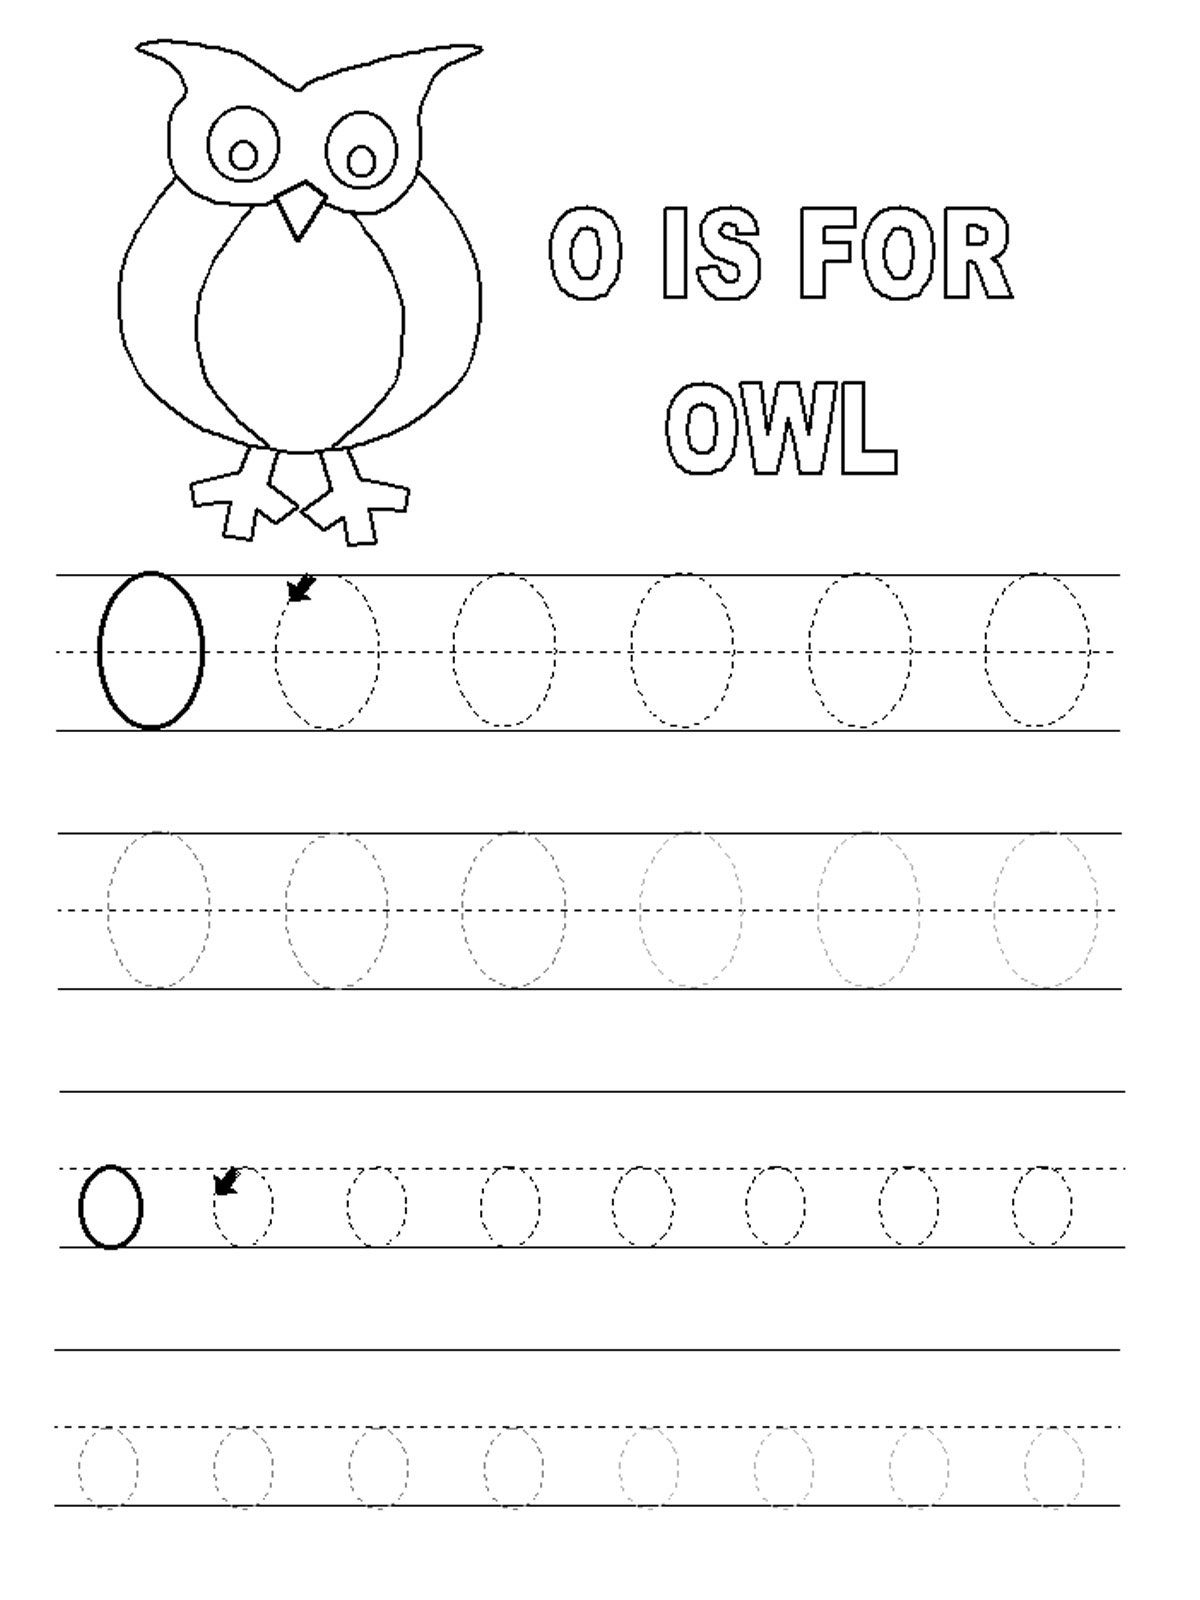 Letter O Worksheets For Preschool | Letter O Worksheets pertaining to Letter 0 Worksheets